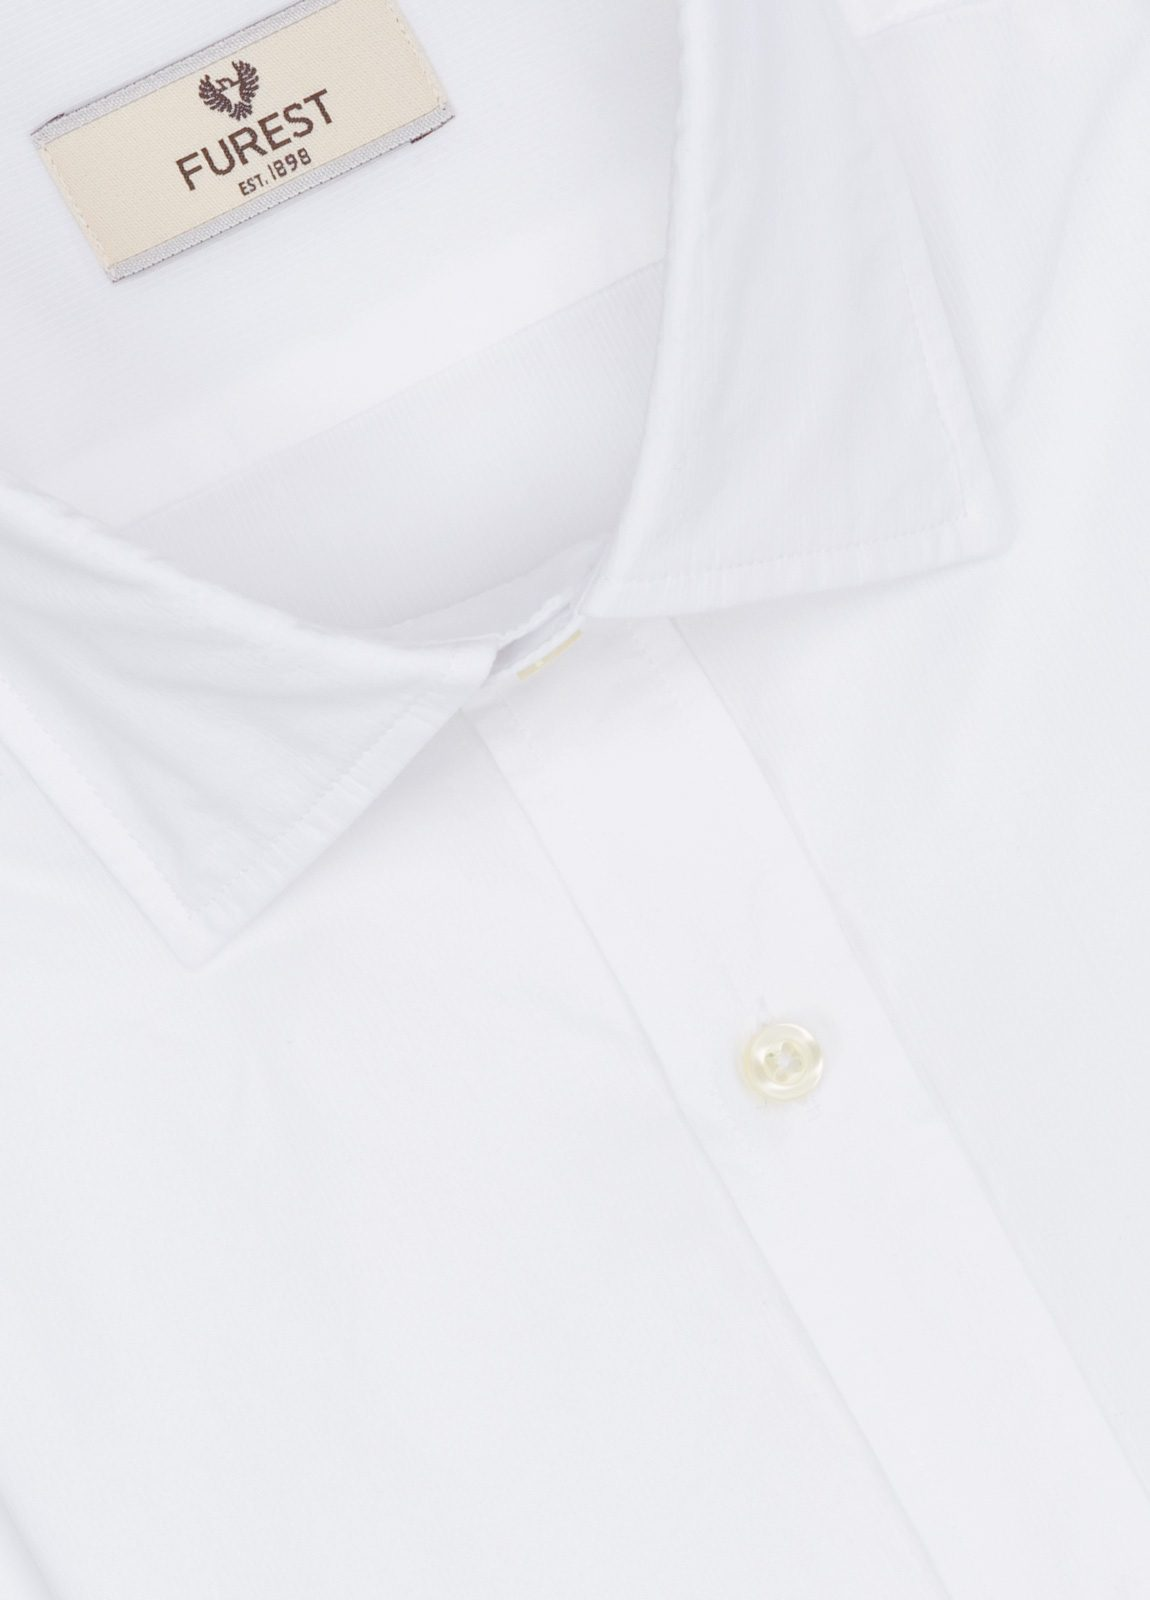 Camisa Leisure Wear SLIM FIT modelo PORTO, micro-textura color blanco . 100% Algodón. - Ítem1